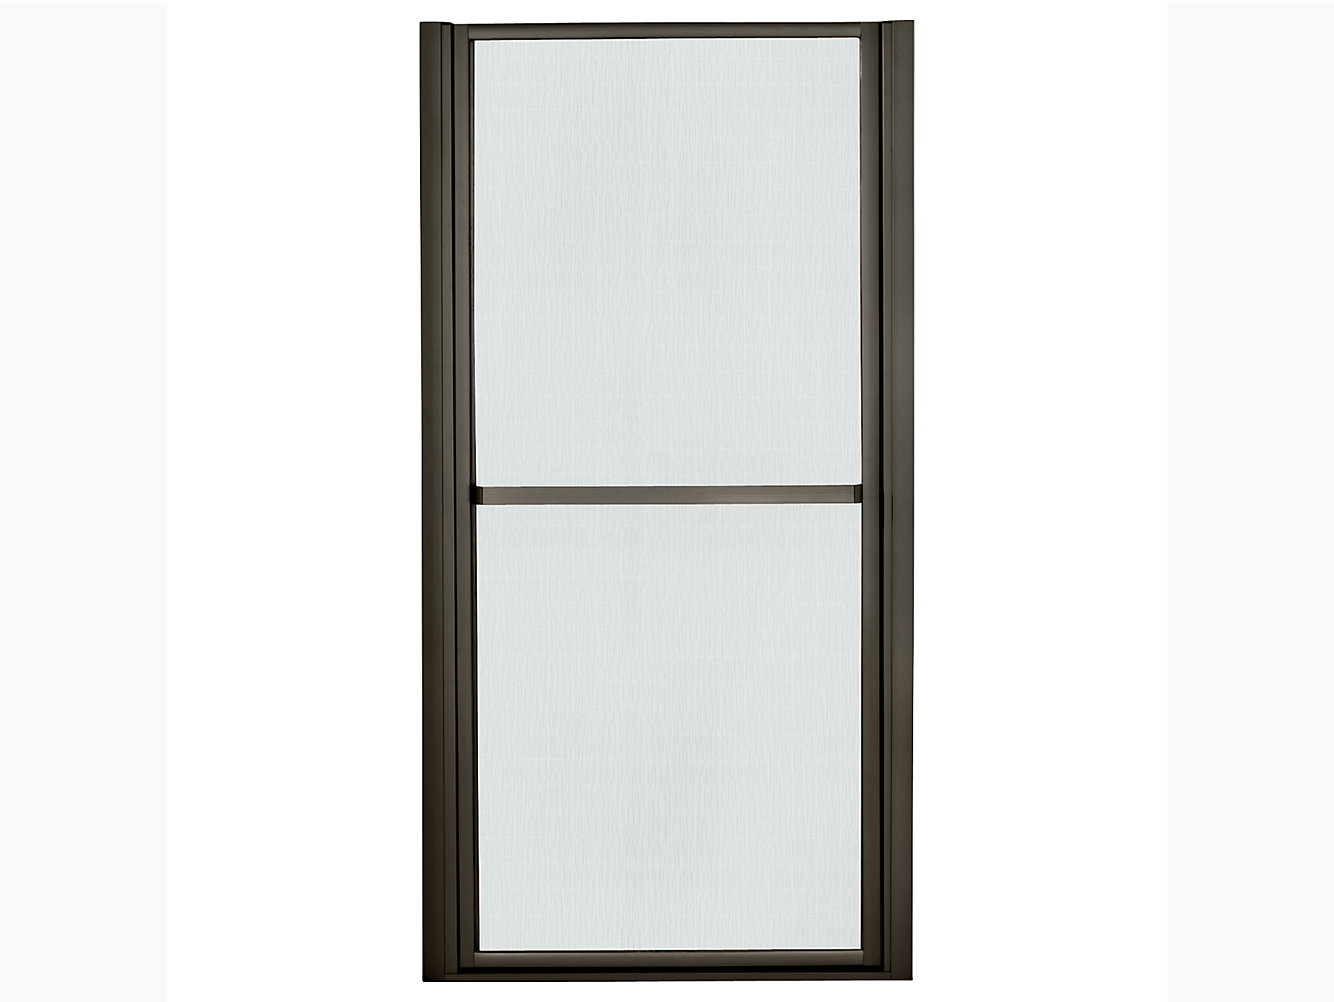 Finesse Framed Swinging Shower Door 36 1239 12 W X 65 12 H